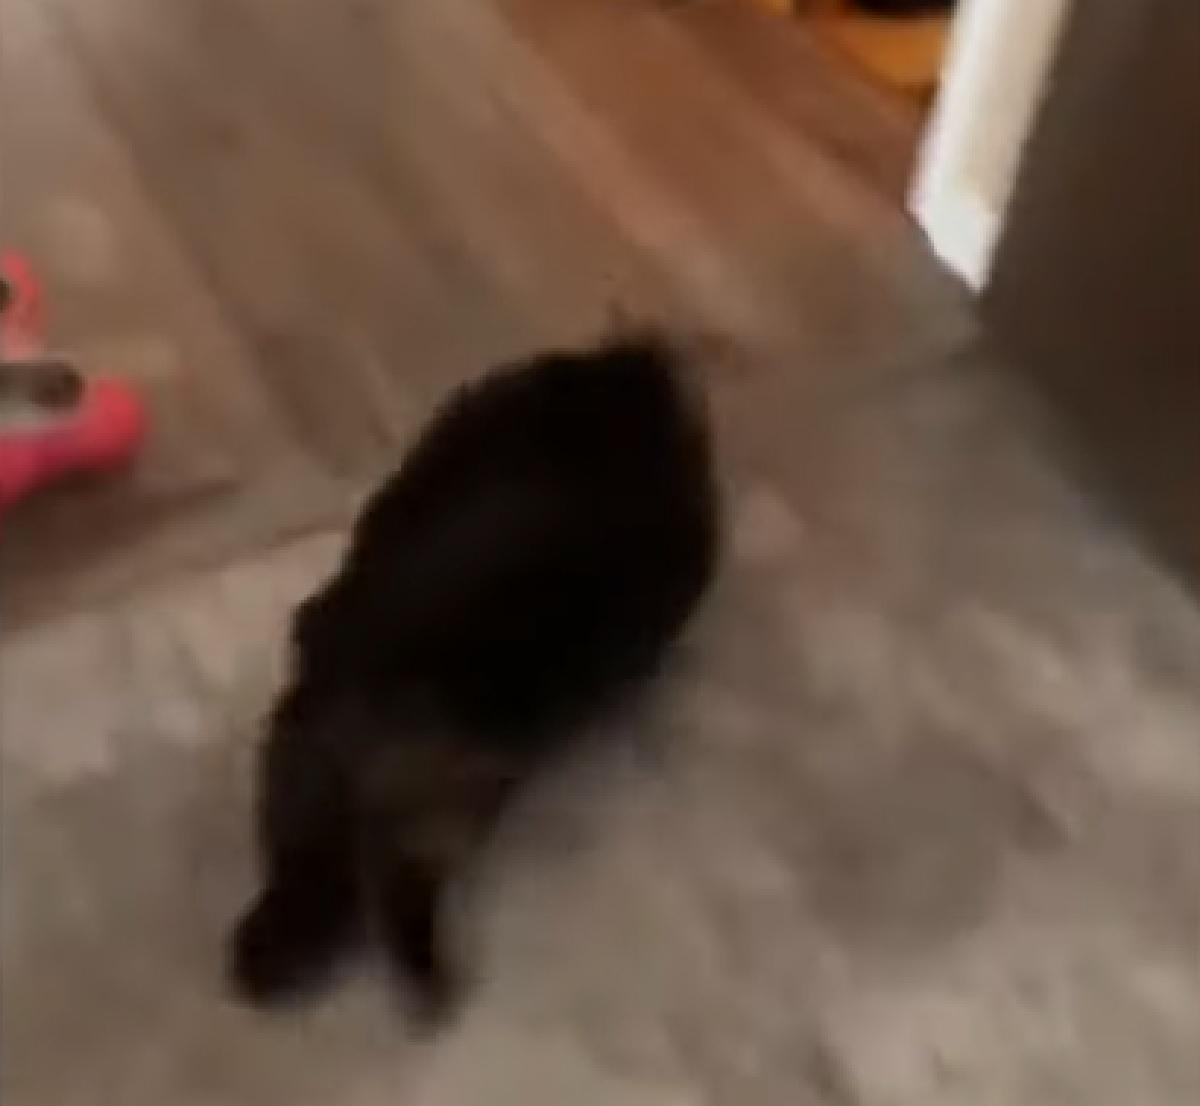 socks gattino risate proprietari